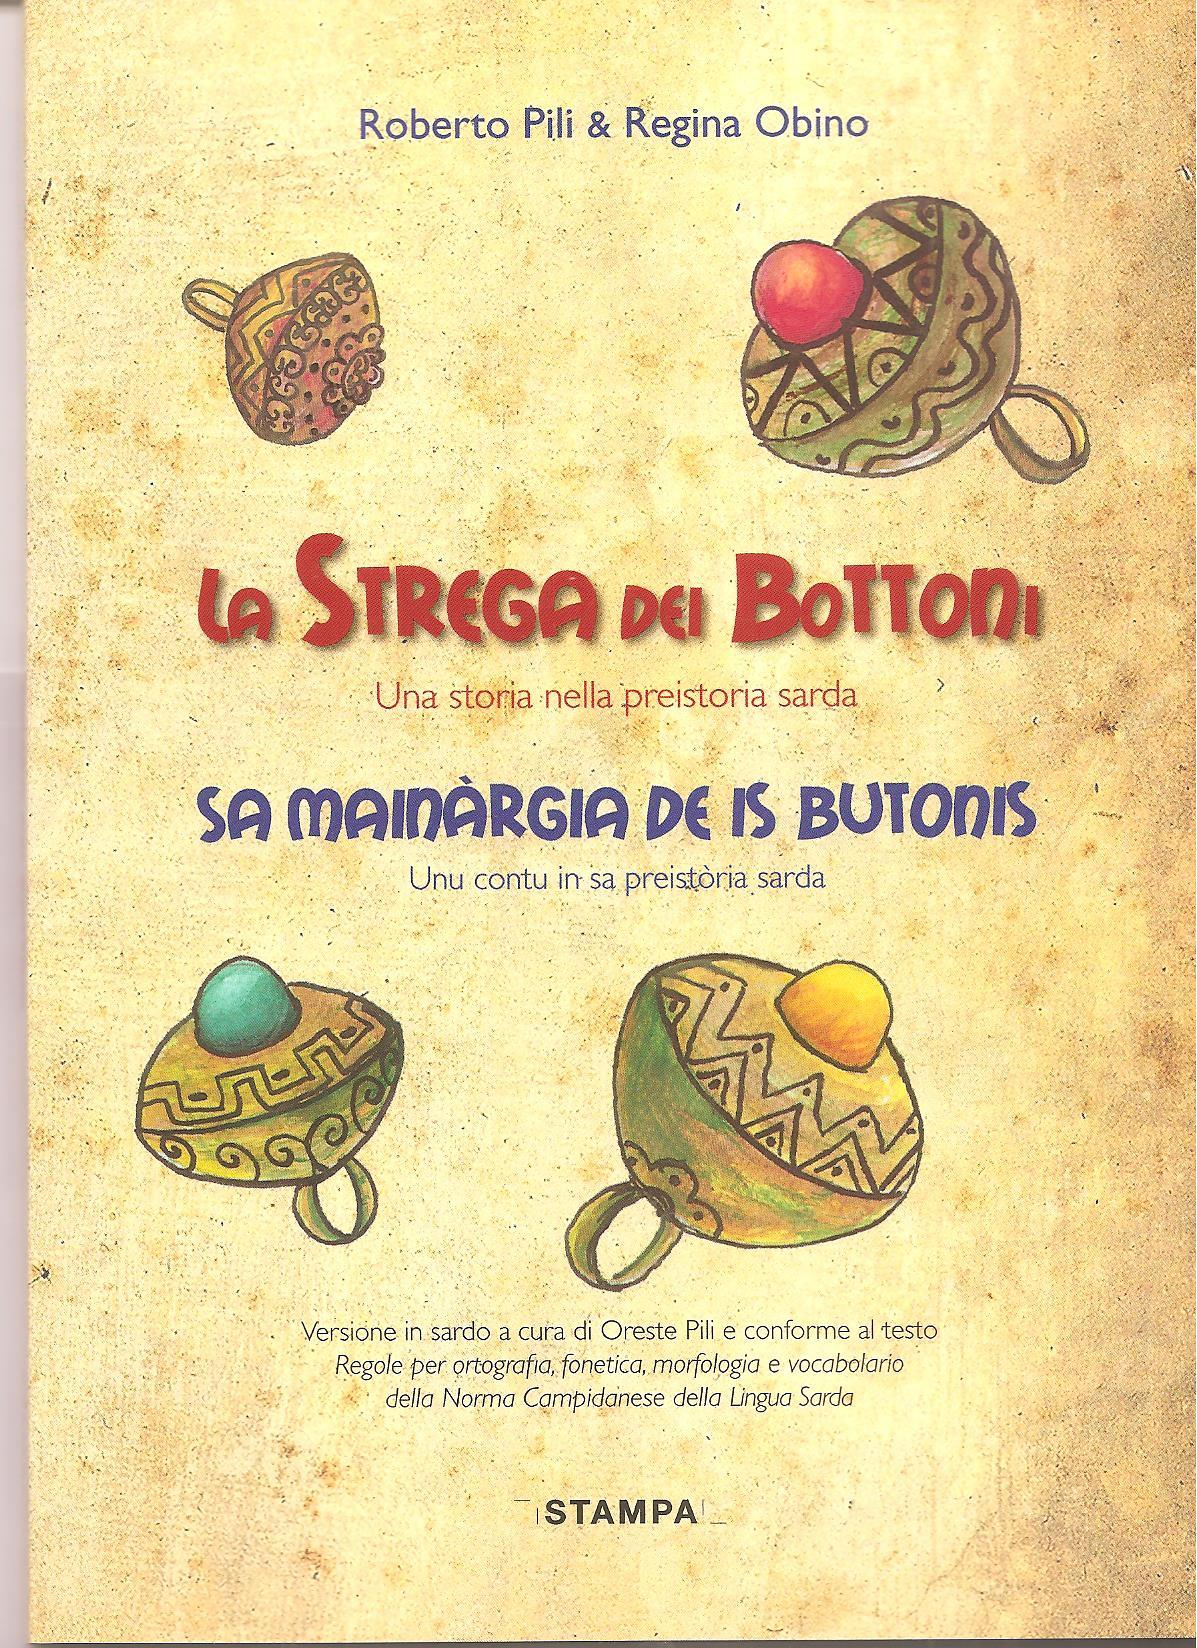 SA MAINARGIA DE IS BUTONIS 001